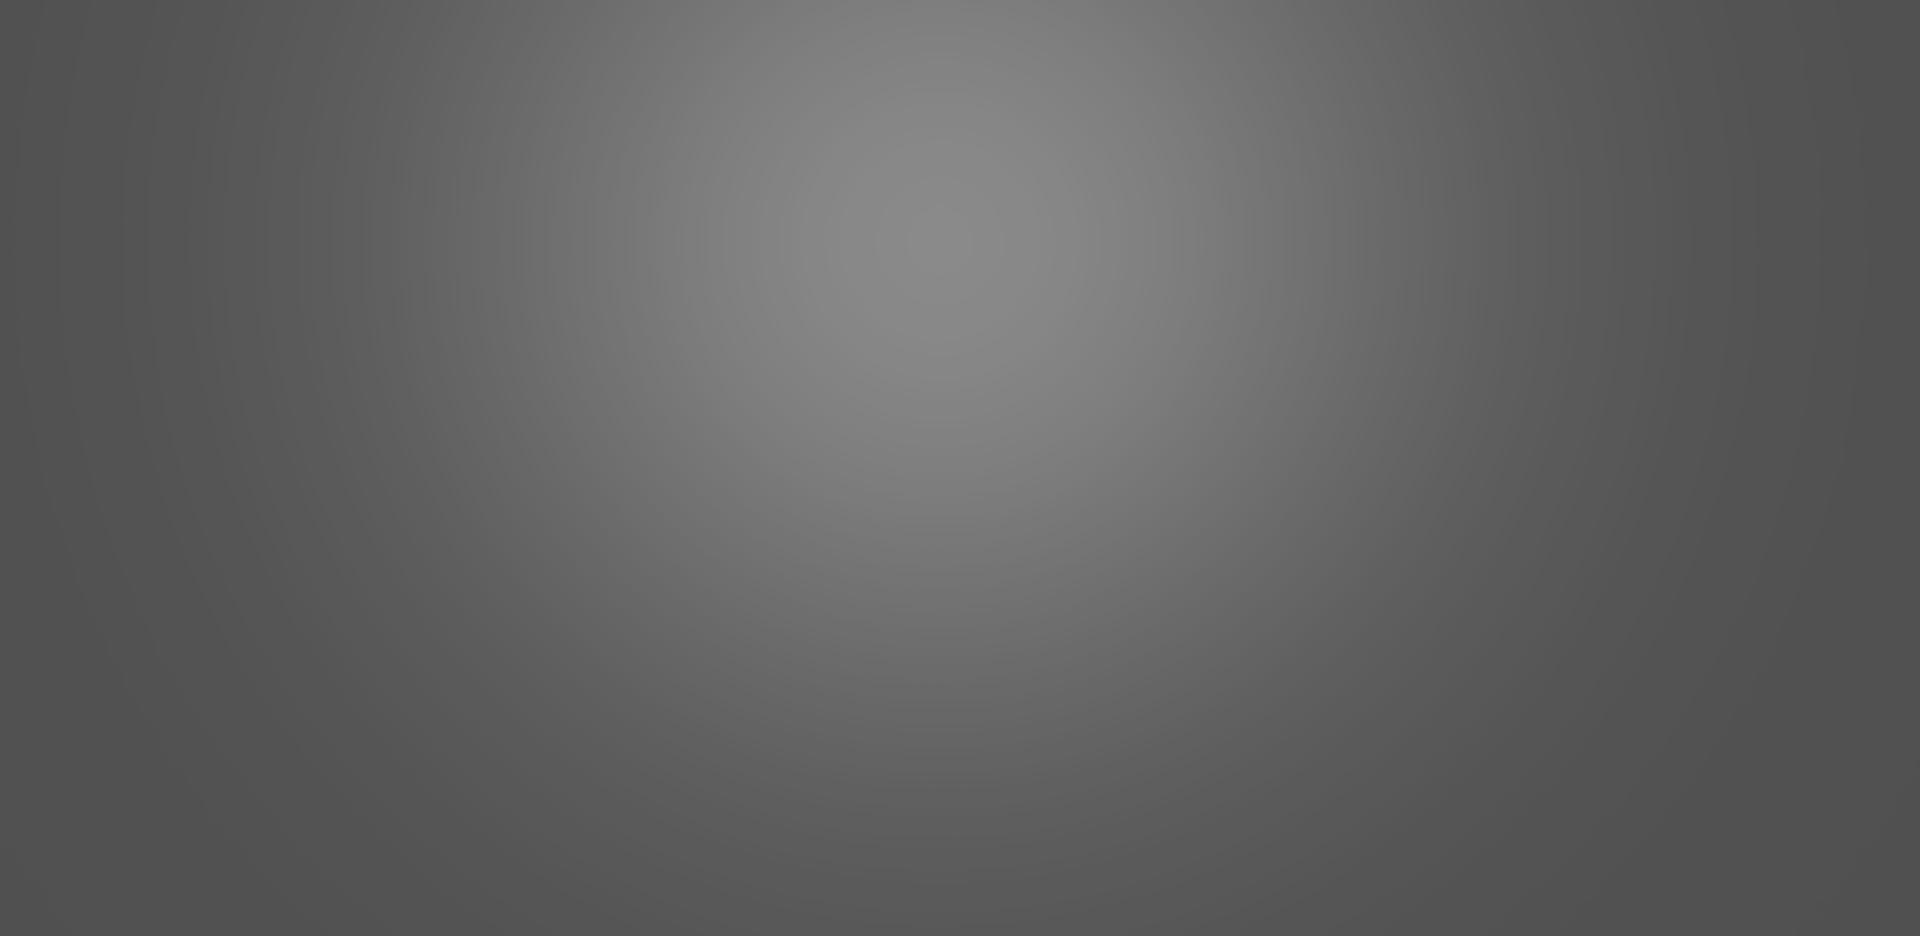 Lucid grey background